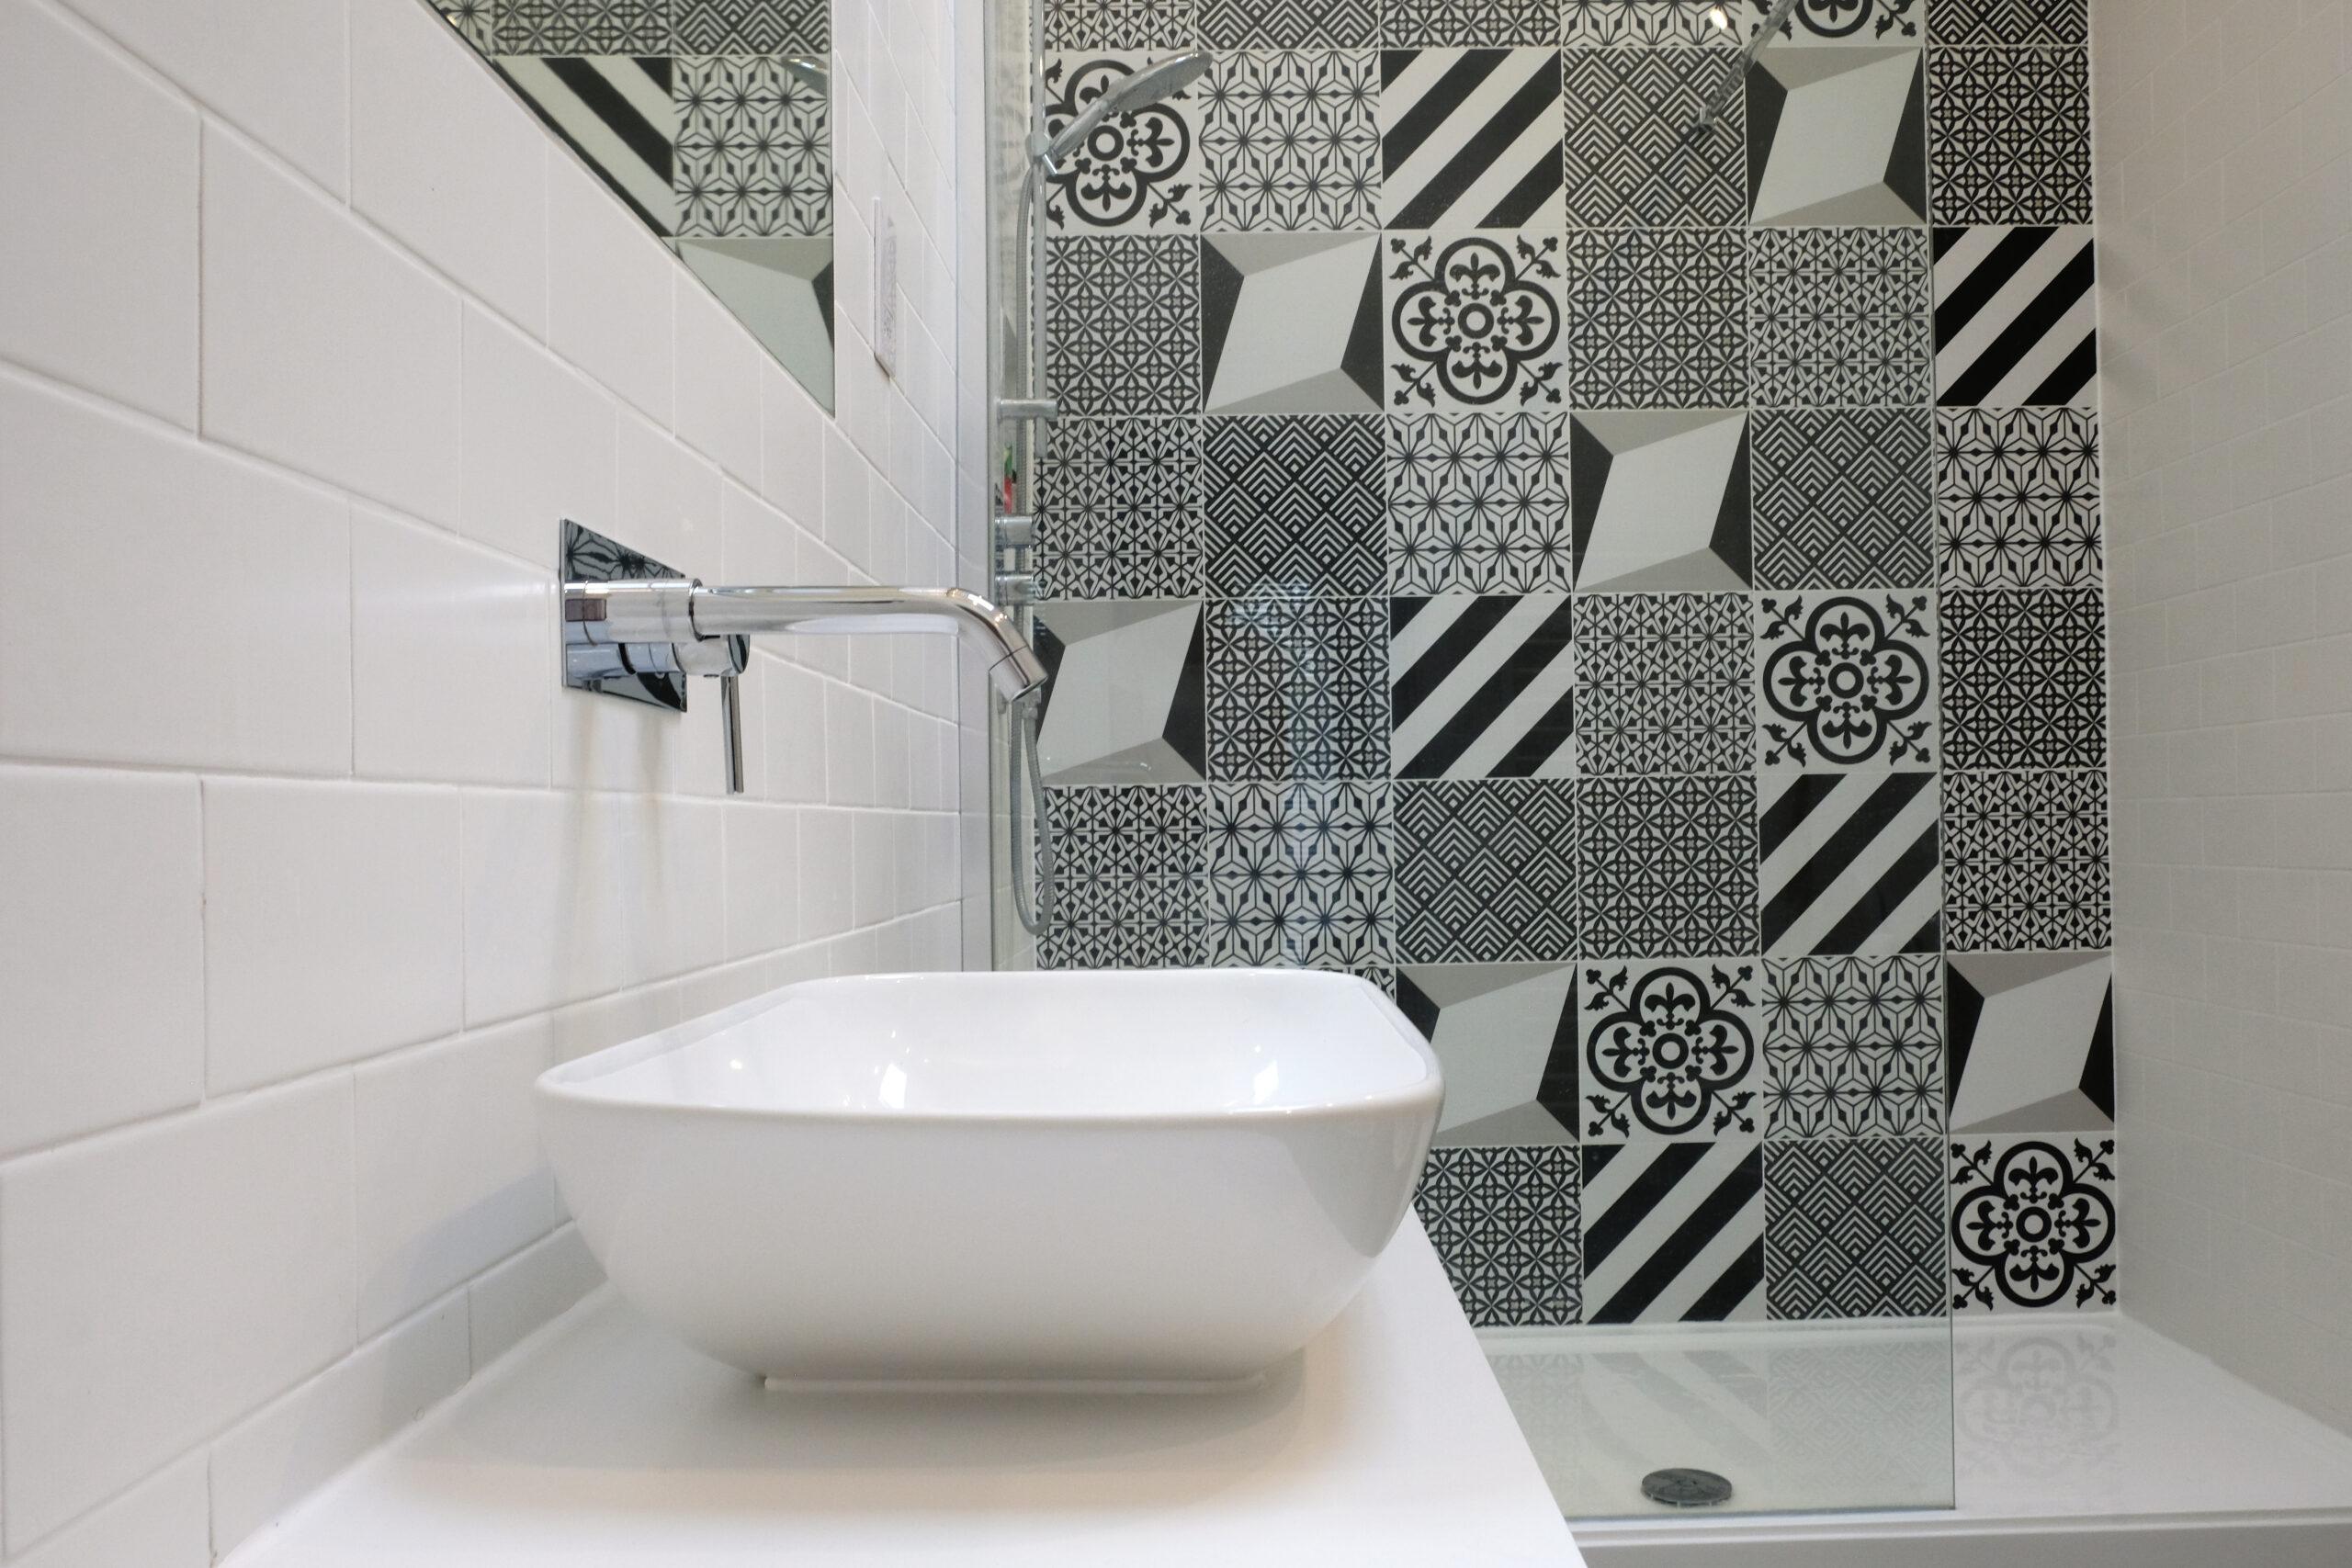 sink pattern tiles